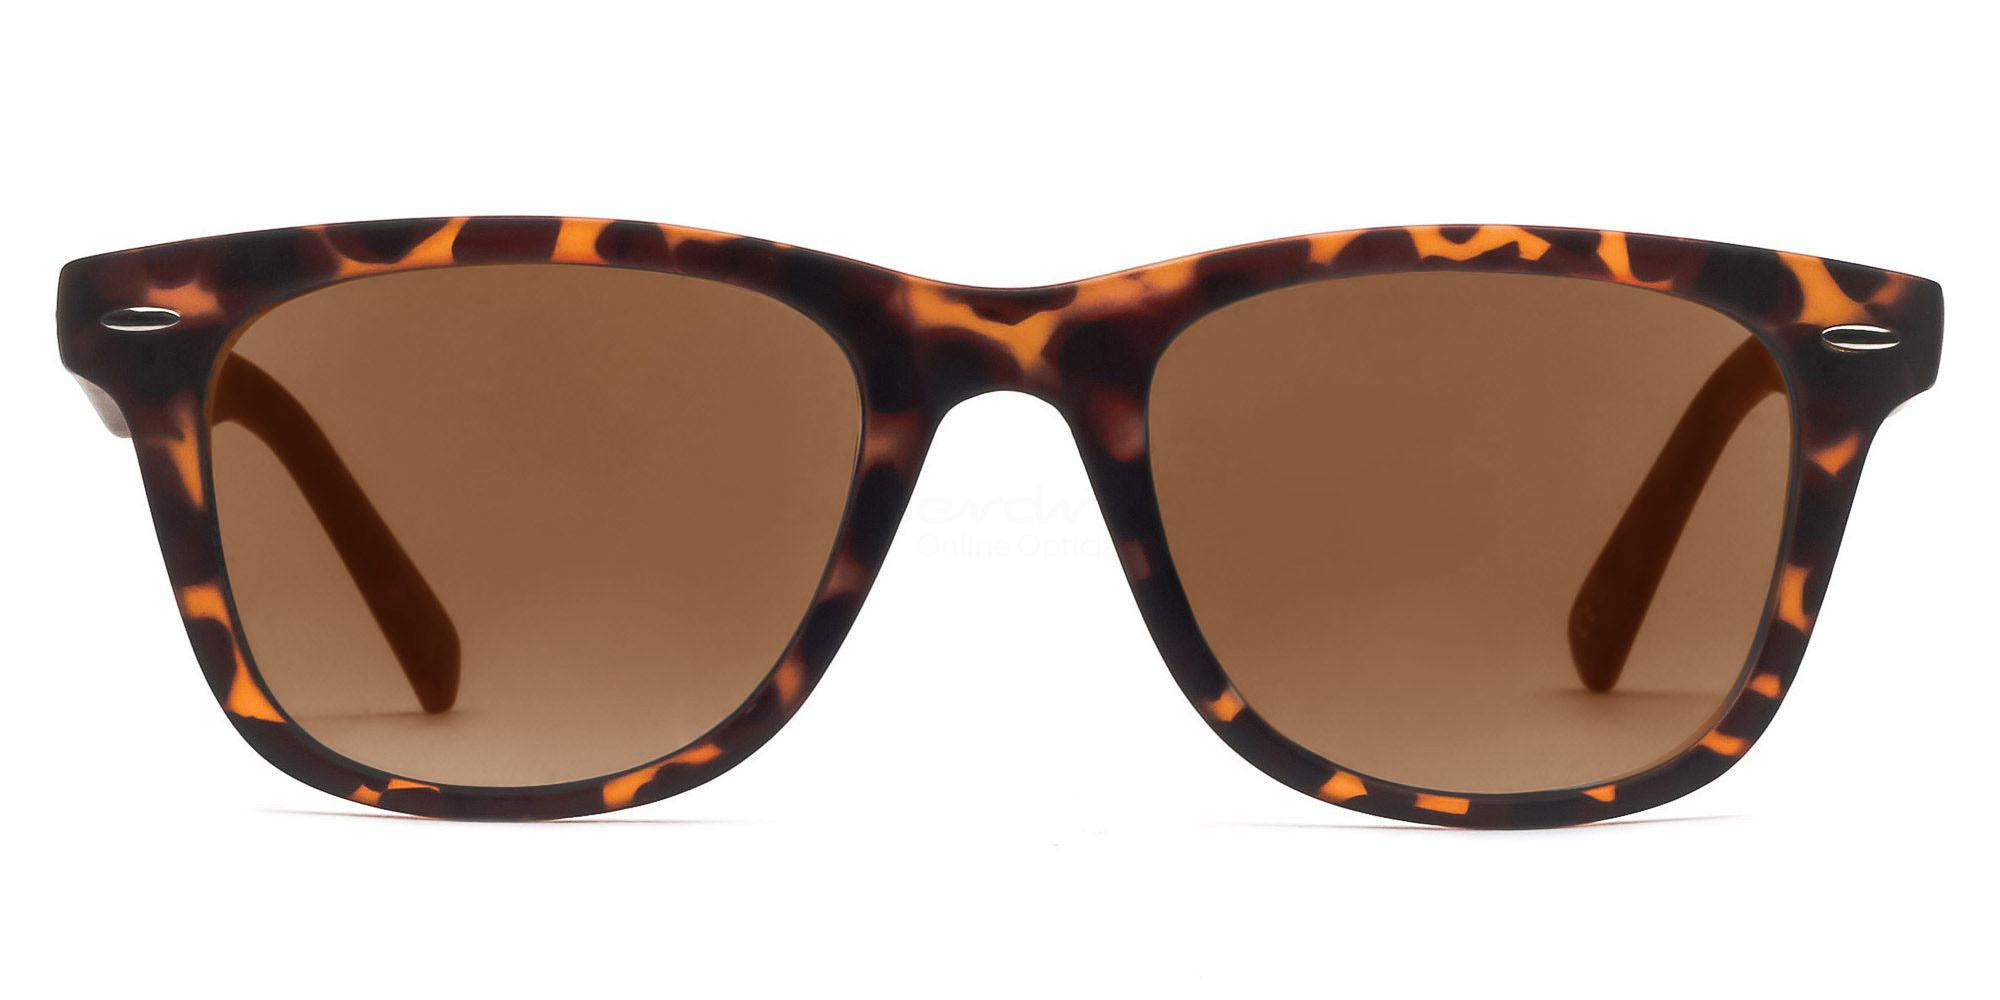 C9 8121 - Tortoise (Sunglasses) Sunglasses, Helium